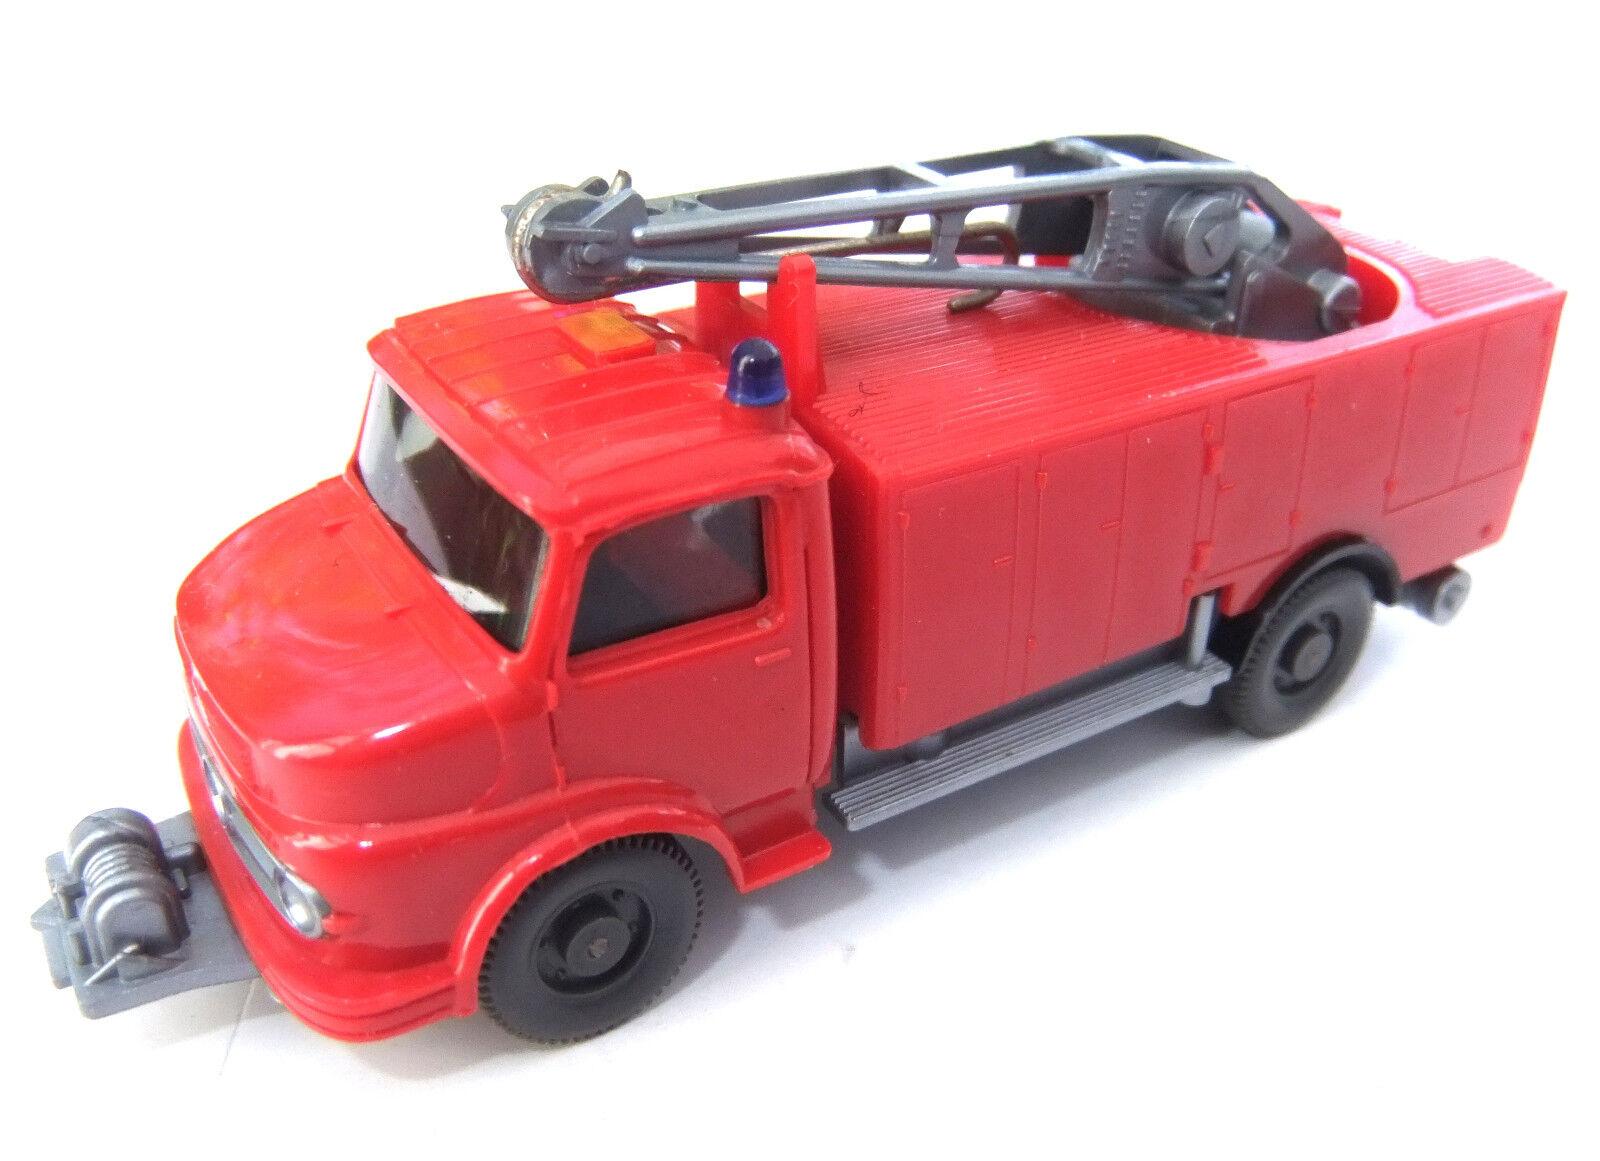 Wiking rüstwagen con grúa MB 1413 ho 1 87 ácidas 1067 1 con haltehasen